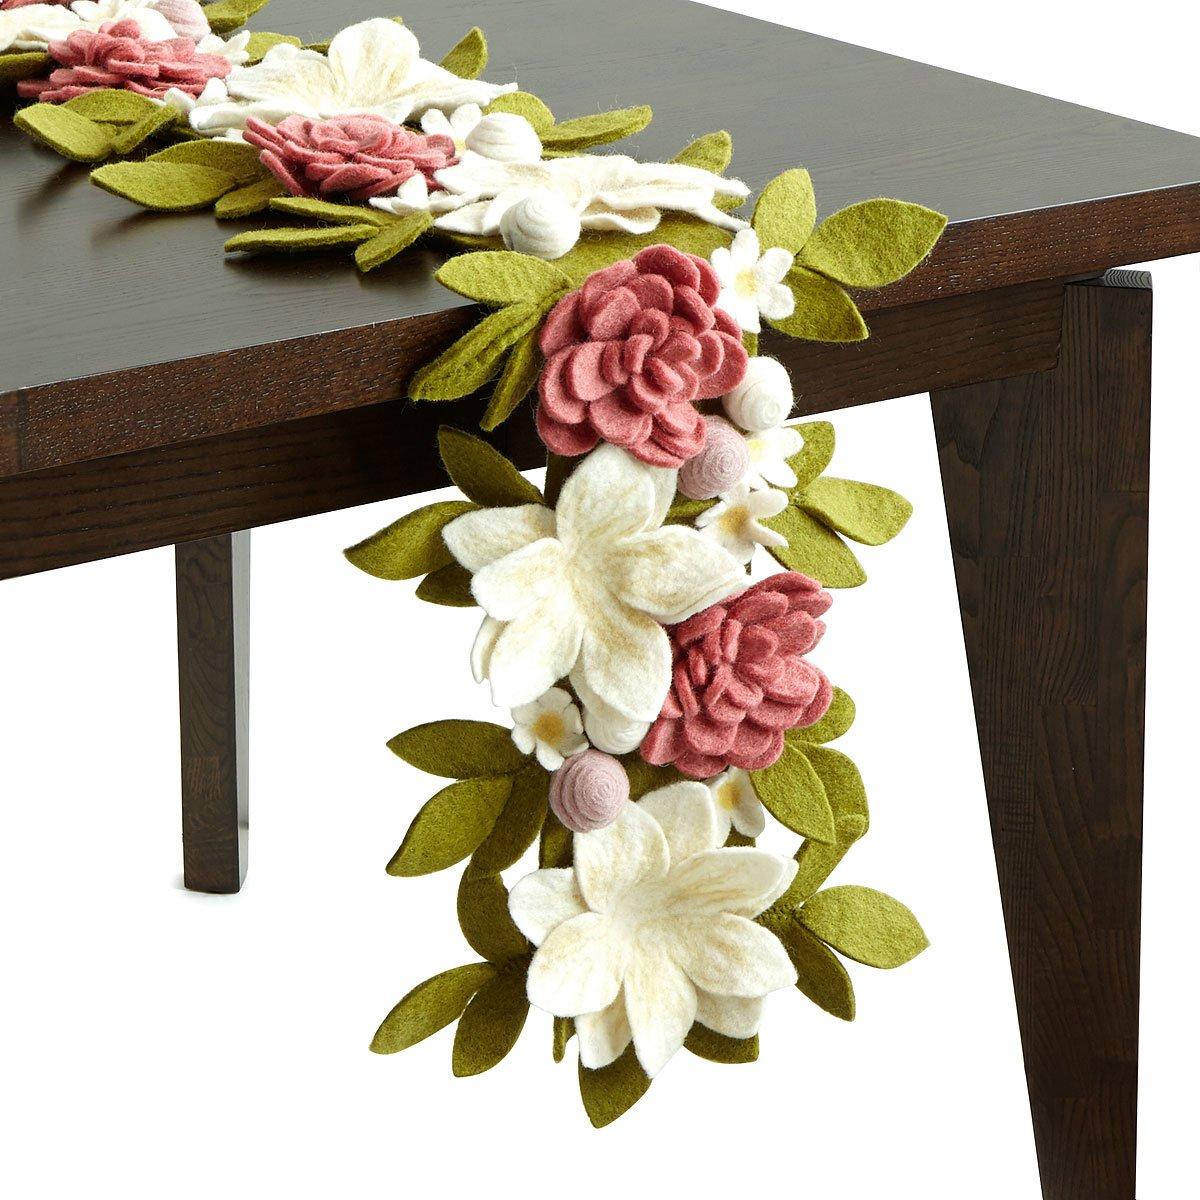 floral garden felt table runner  floral table runner  uncommongoods - floral garden felt table runner  thumbnail